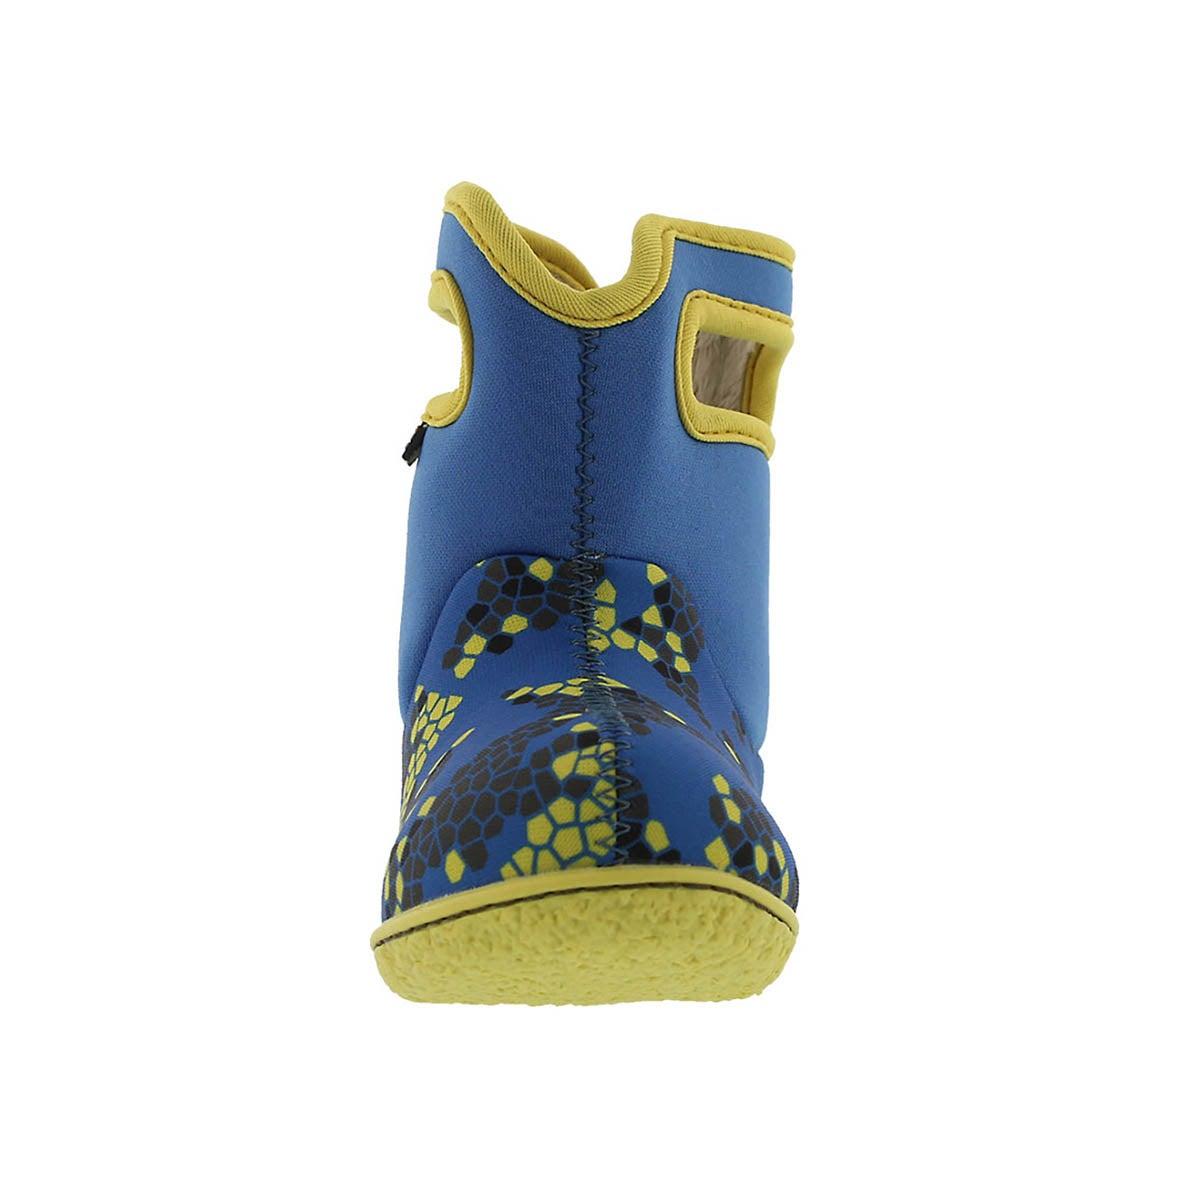 Inf-b Axel blue multi wtpf boot